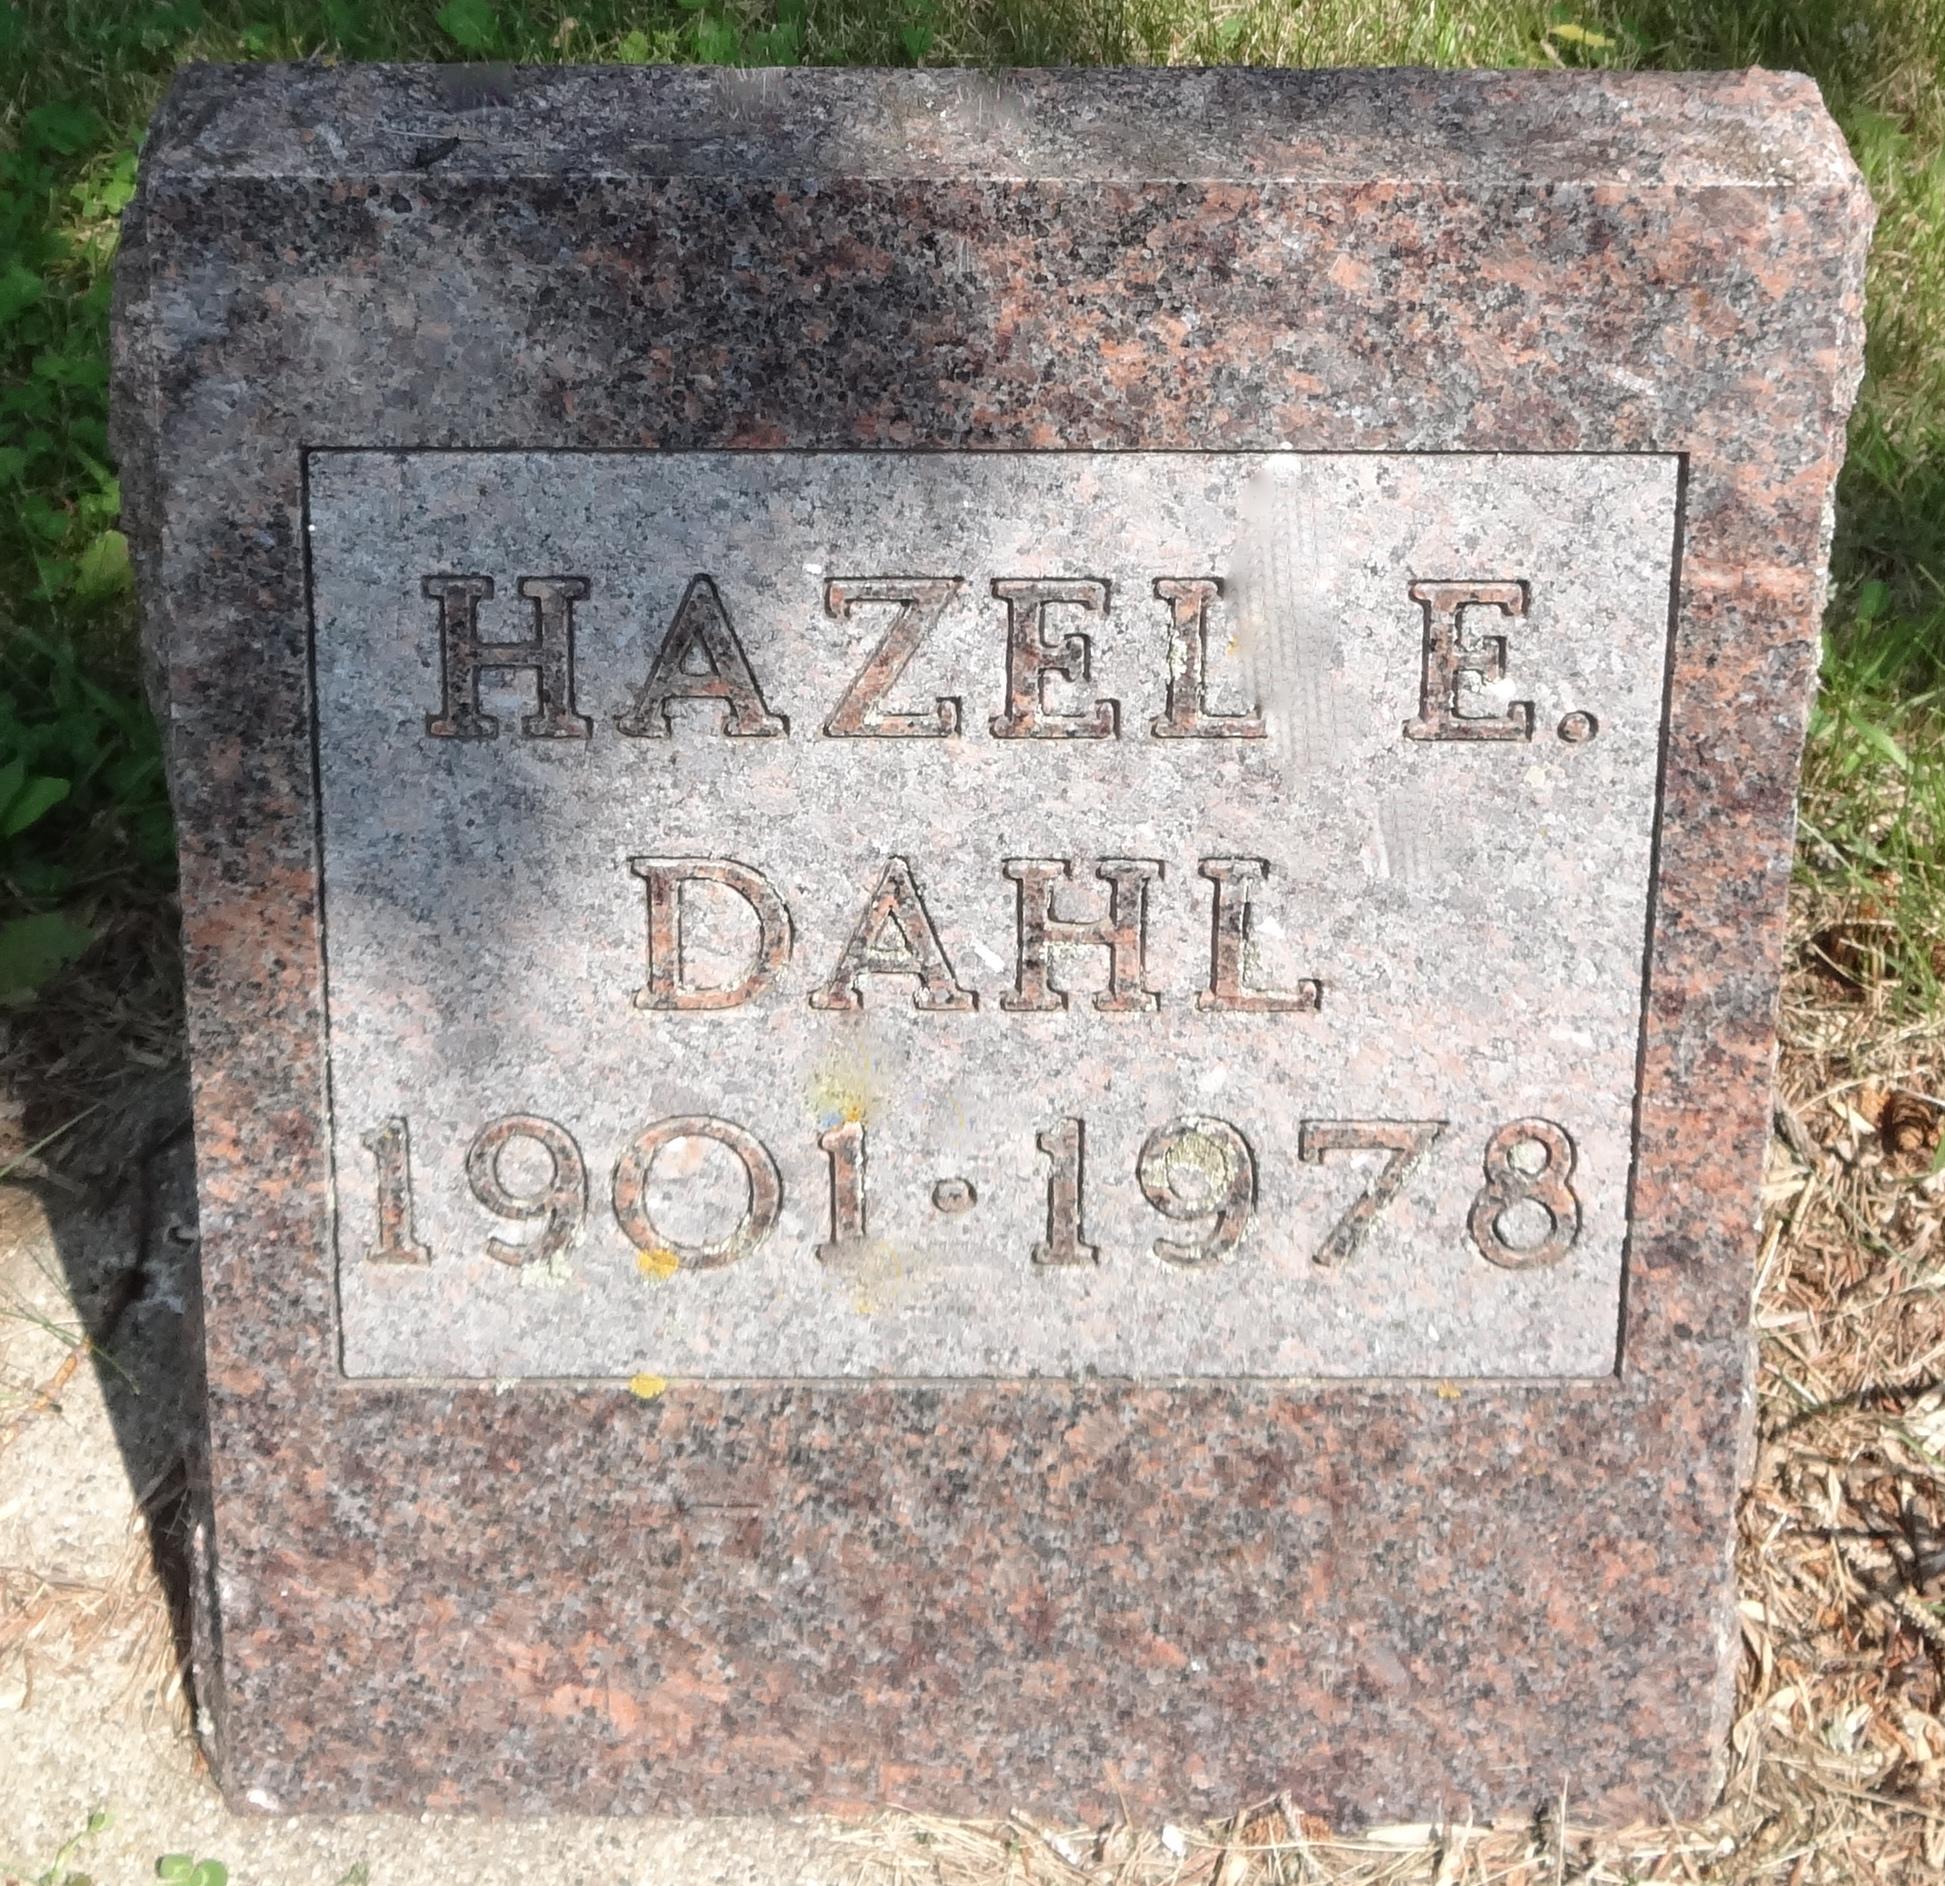 Hazel E Dahl